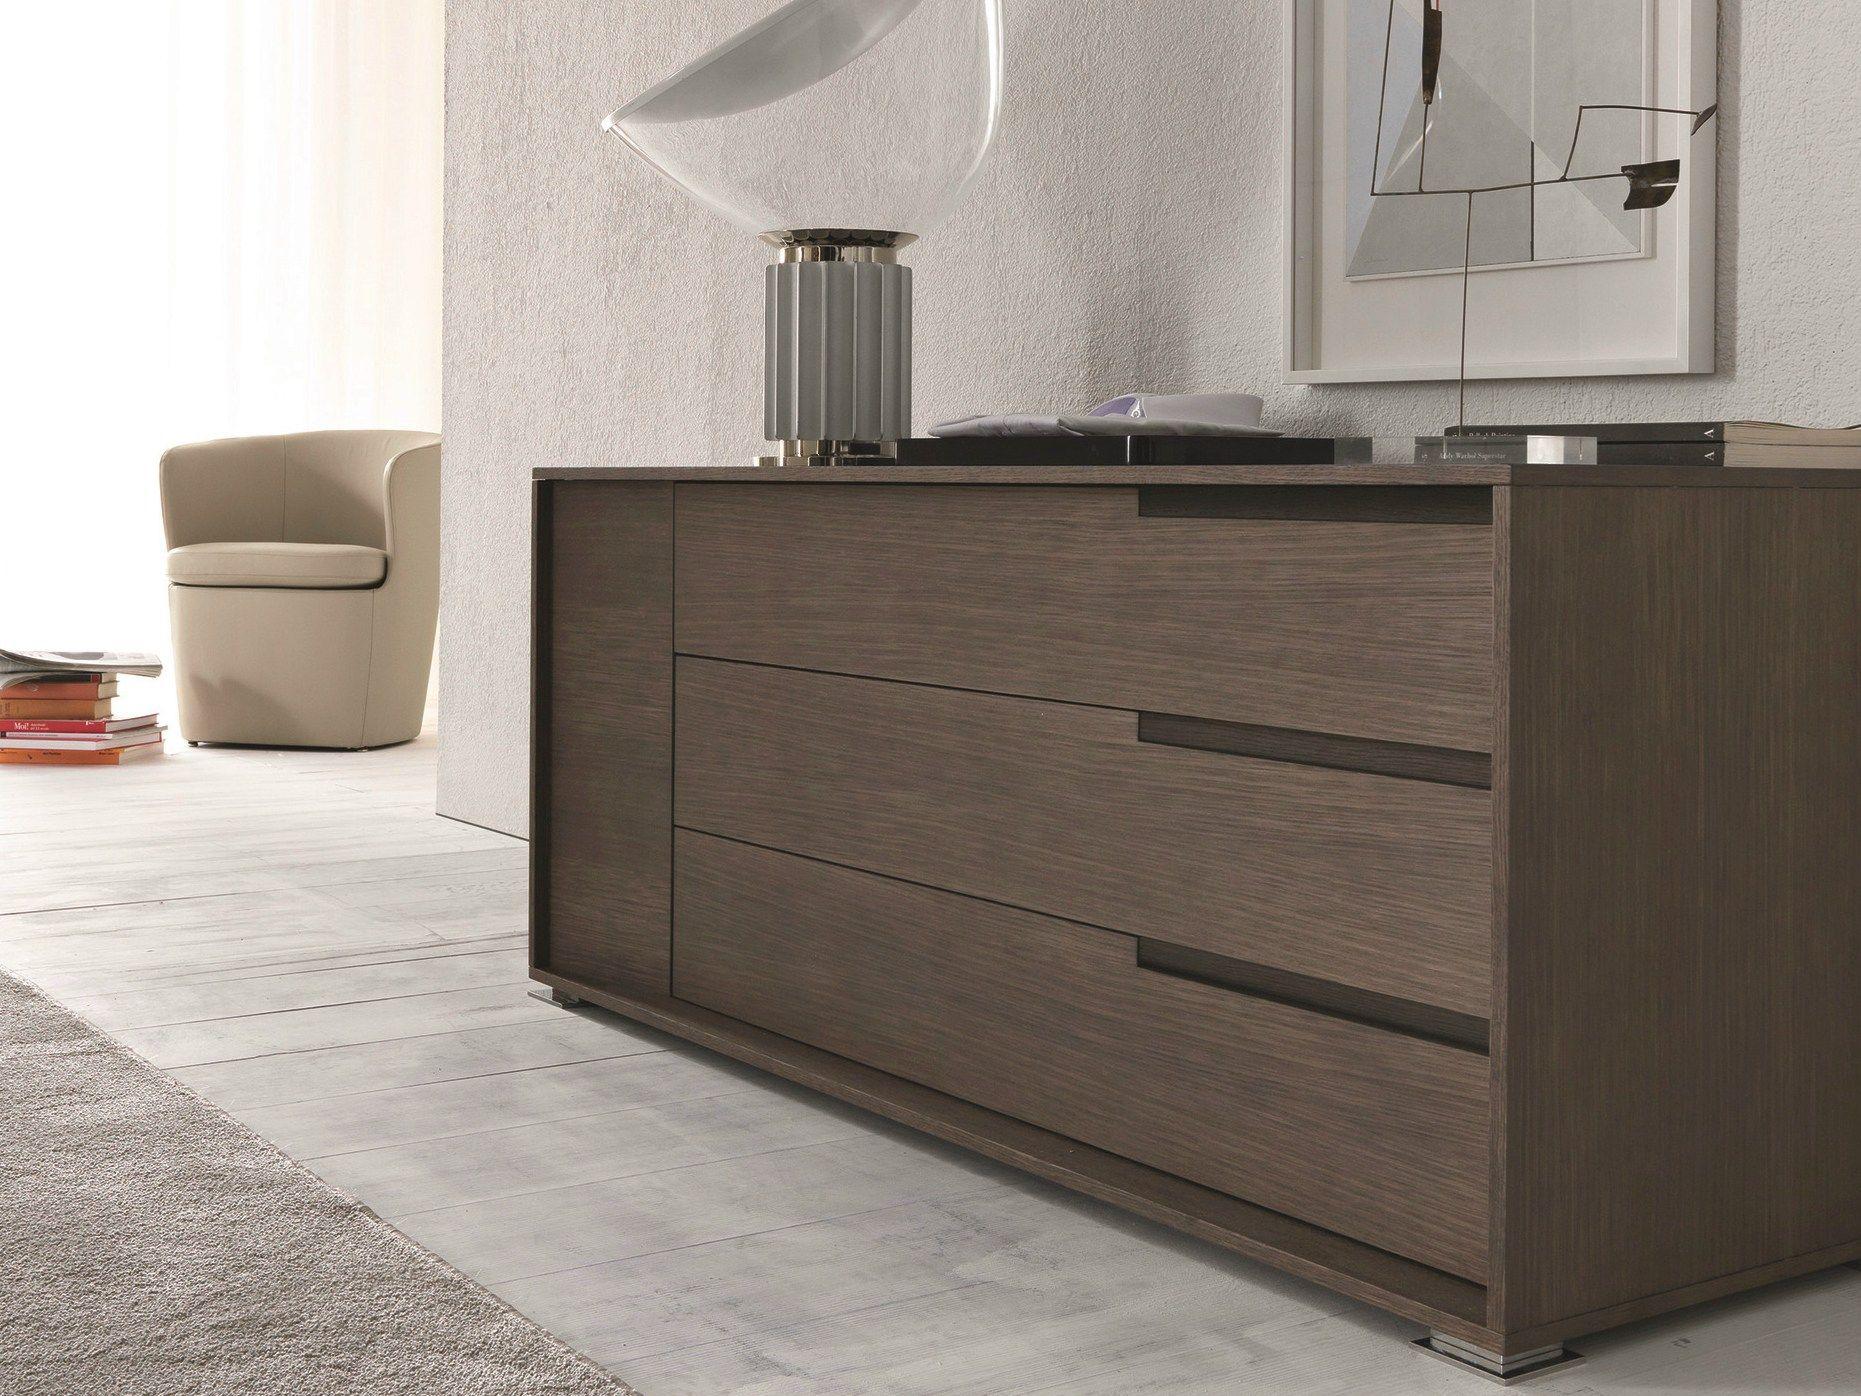 misuraemme furniture. Products By MisuraEmme Misuraemme Furniture I